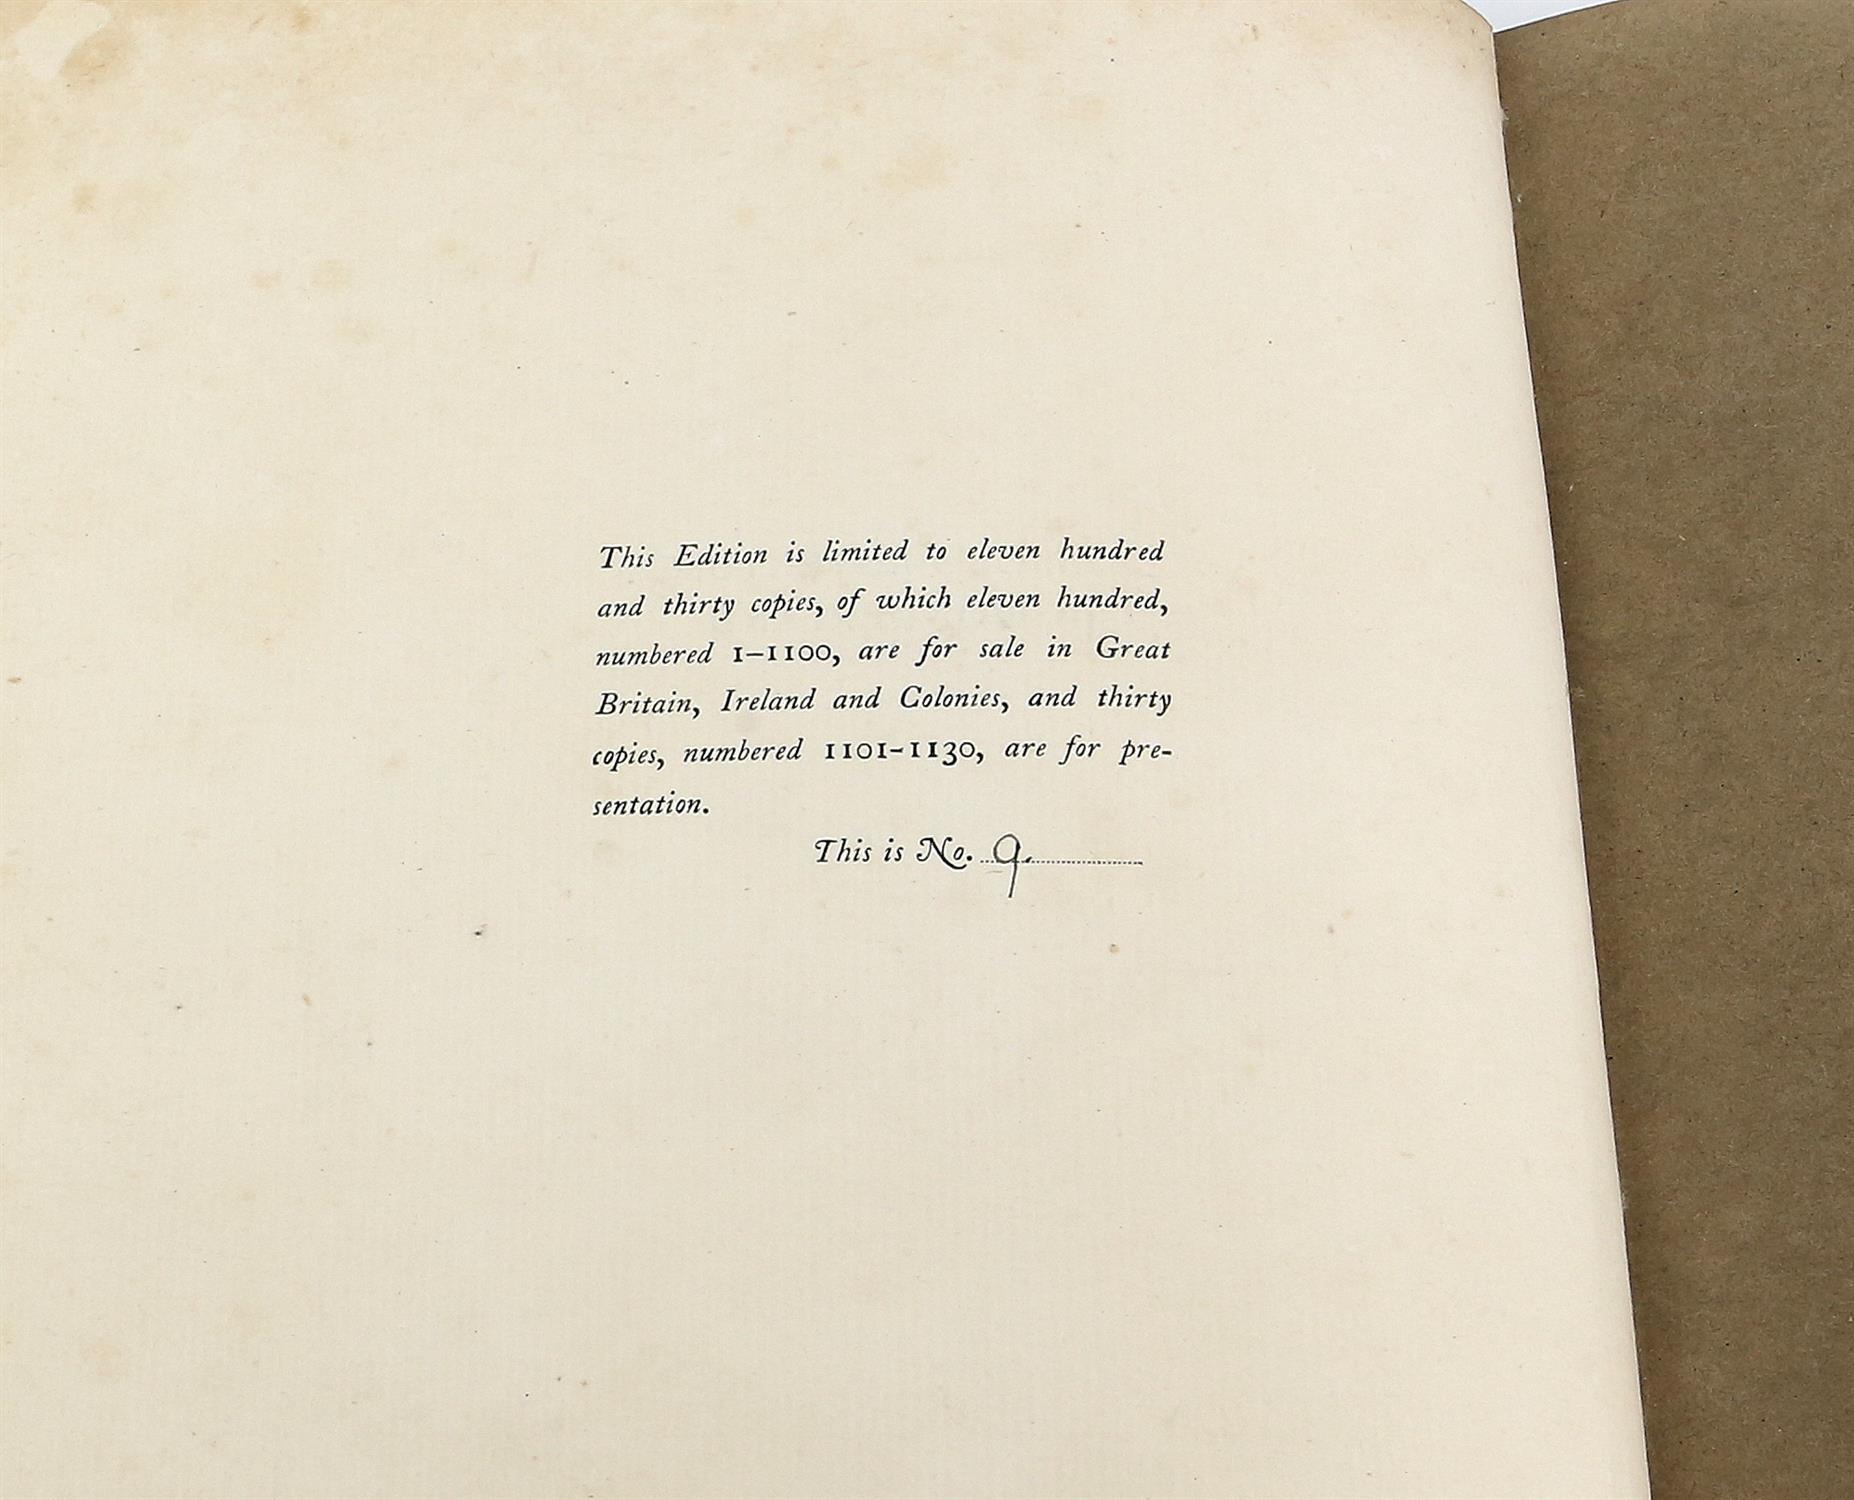 Carroll, Lewis, Alice's Adventures in Wonderland, illustrated by Arthur Rackham.W.Heinemann, - Image 9 of 17